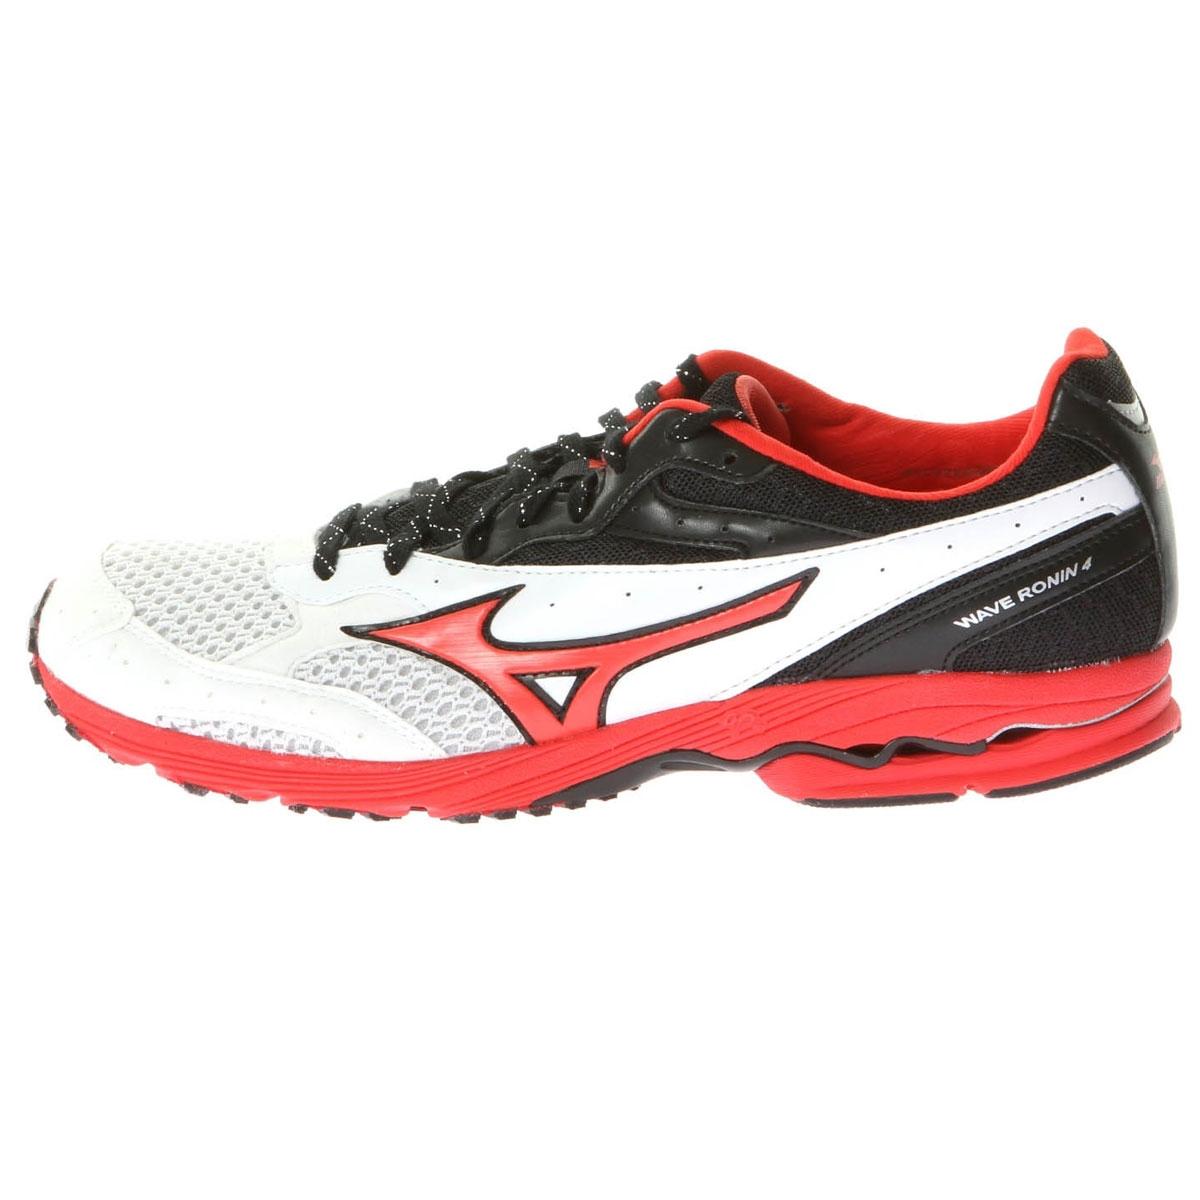 Кроссовки для бега Mizuno Wave Ronin 4 Марафонки red - 3